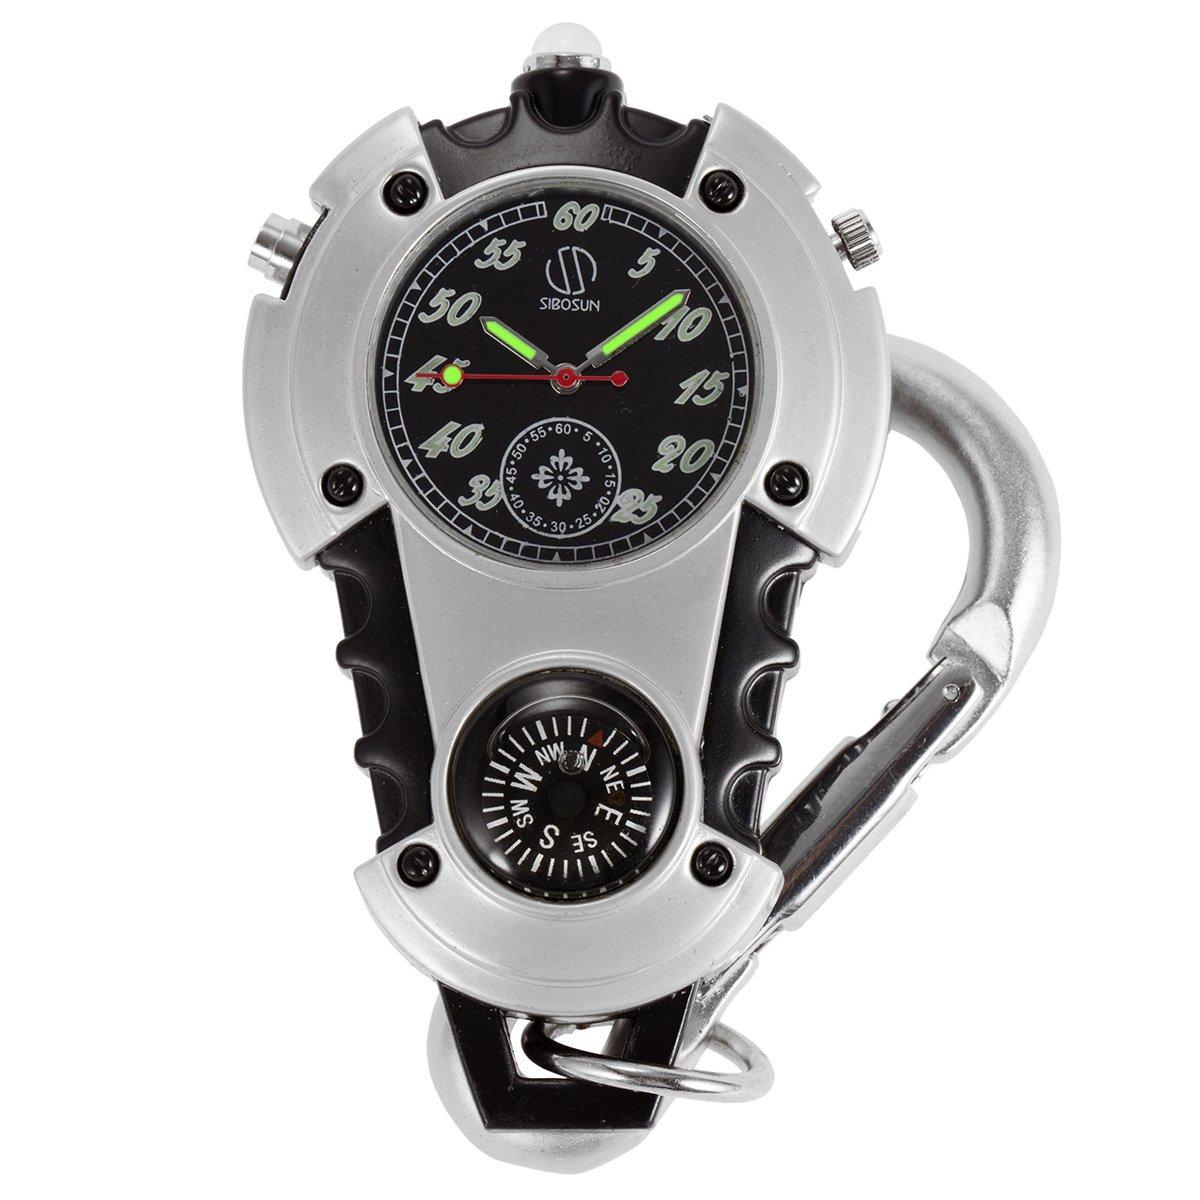 SIBOSUN Watch Company Mini Clip Microlight Nite Glow Luminous Clip on Pocket Watch Black